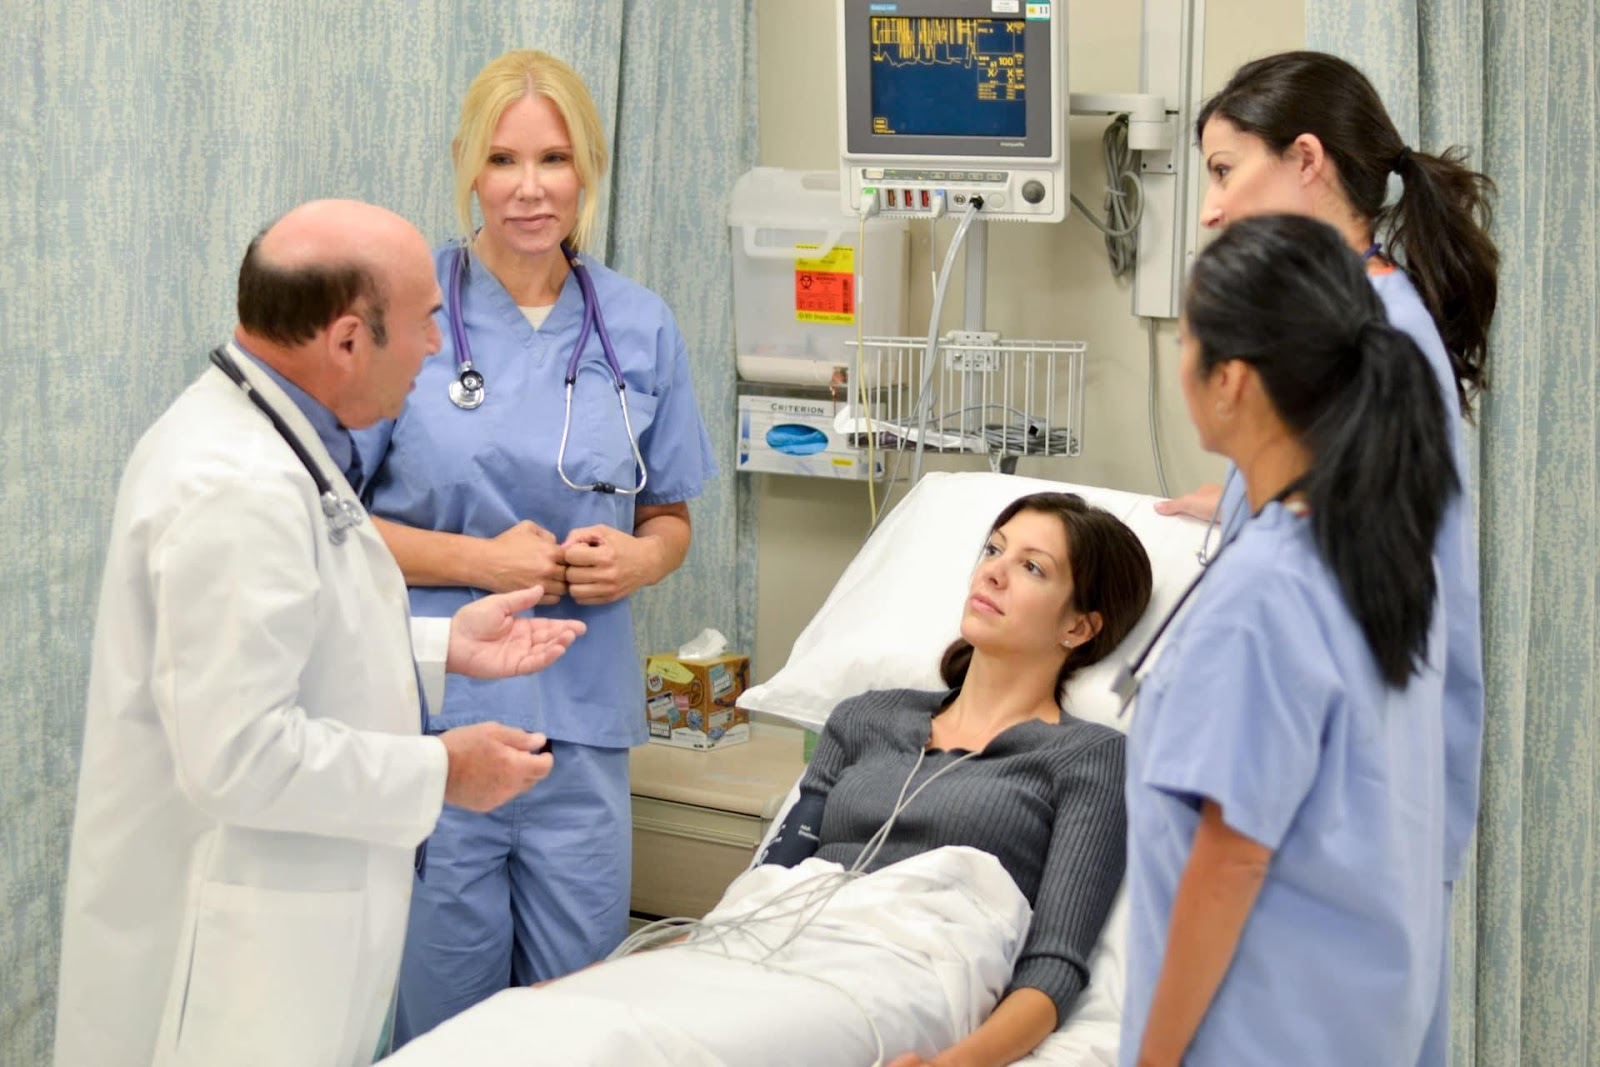 C:\Users\Korisnik\Desktop\Steven-L-Mandel-MD-and-Team-Caring-for-a-Patient.jpg